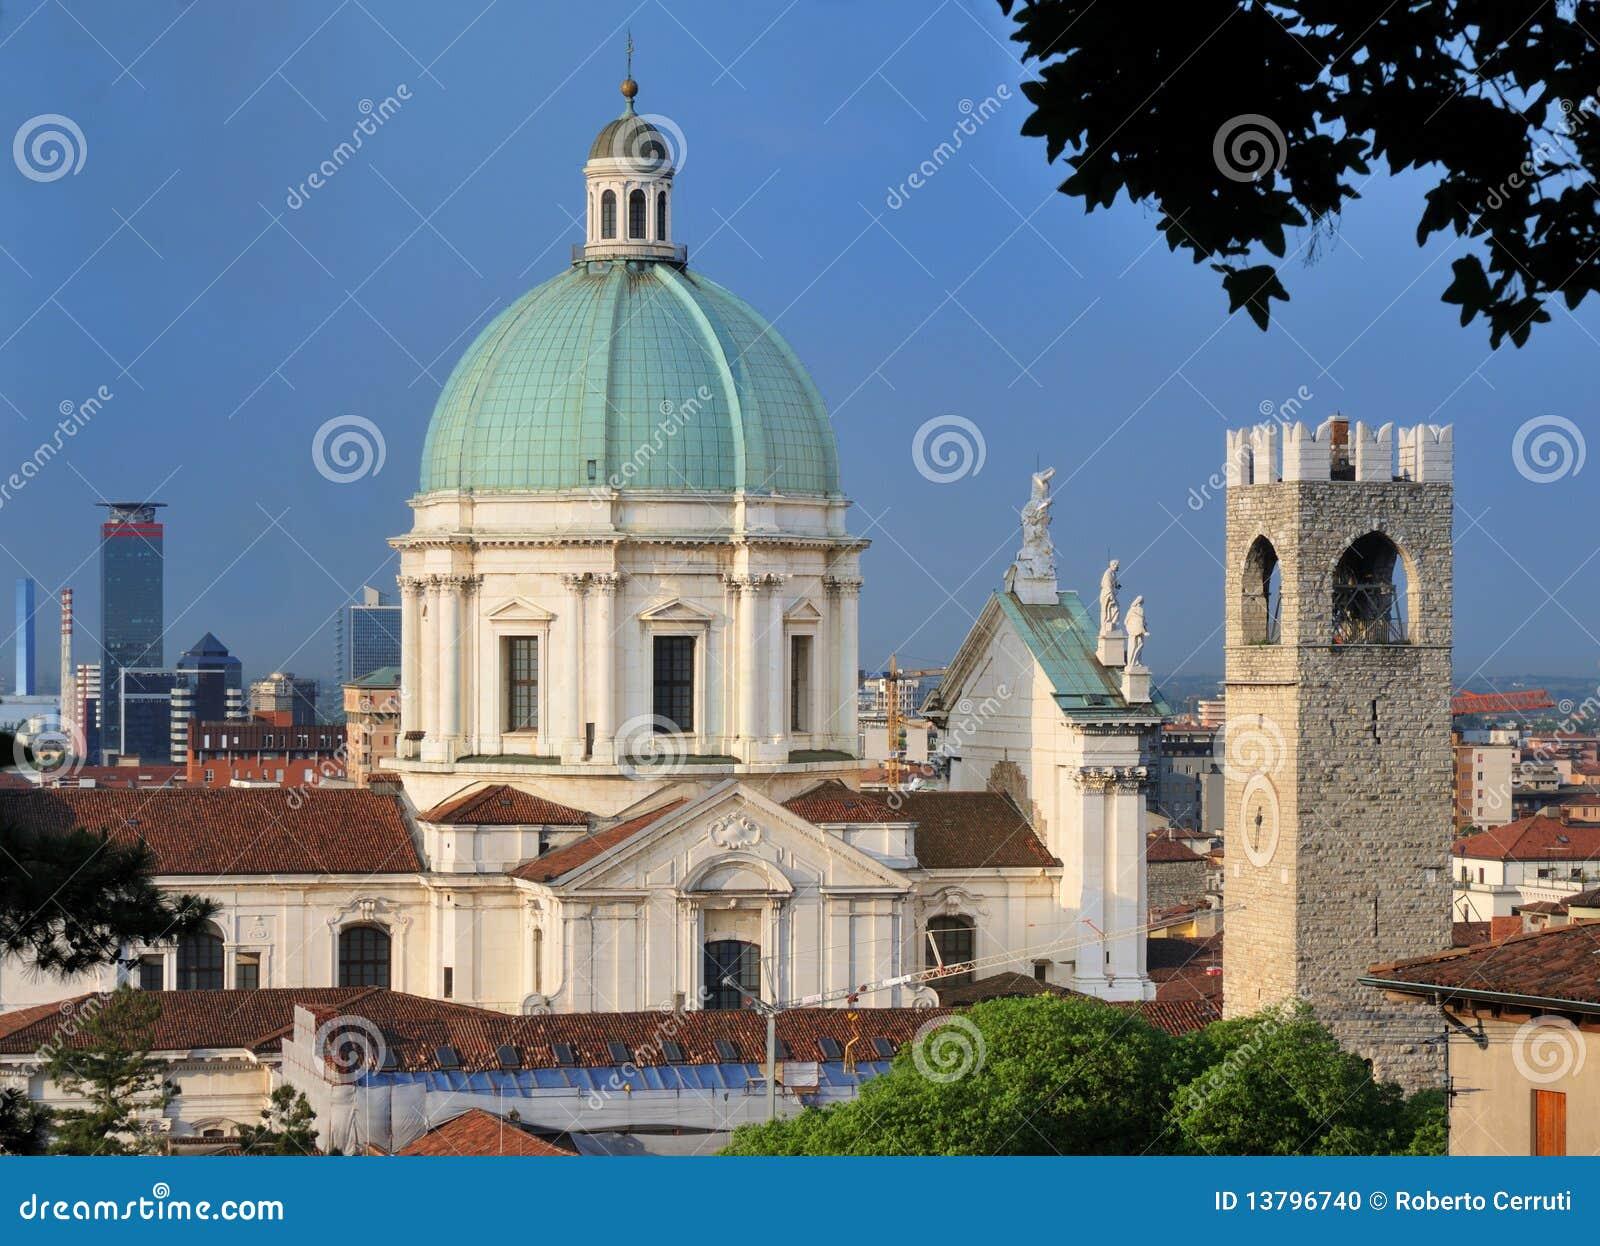 leopoli brescia italy - photo#10